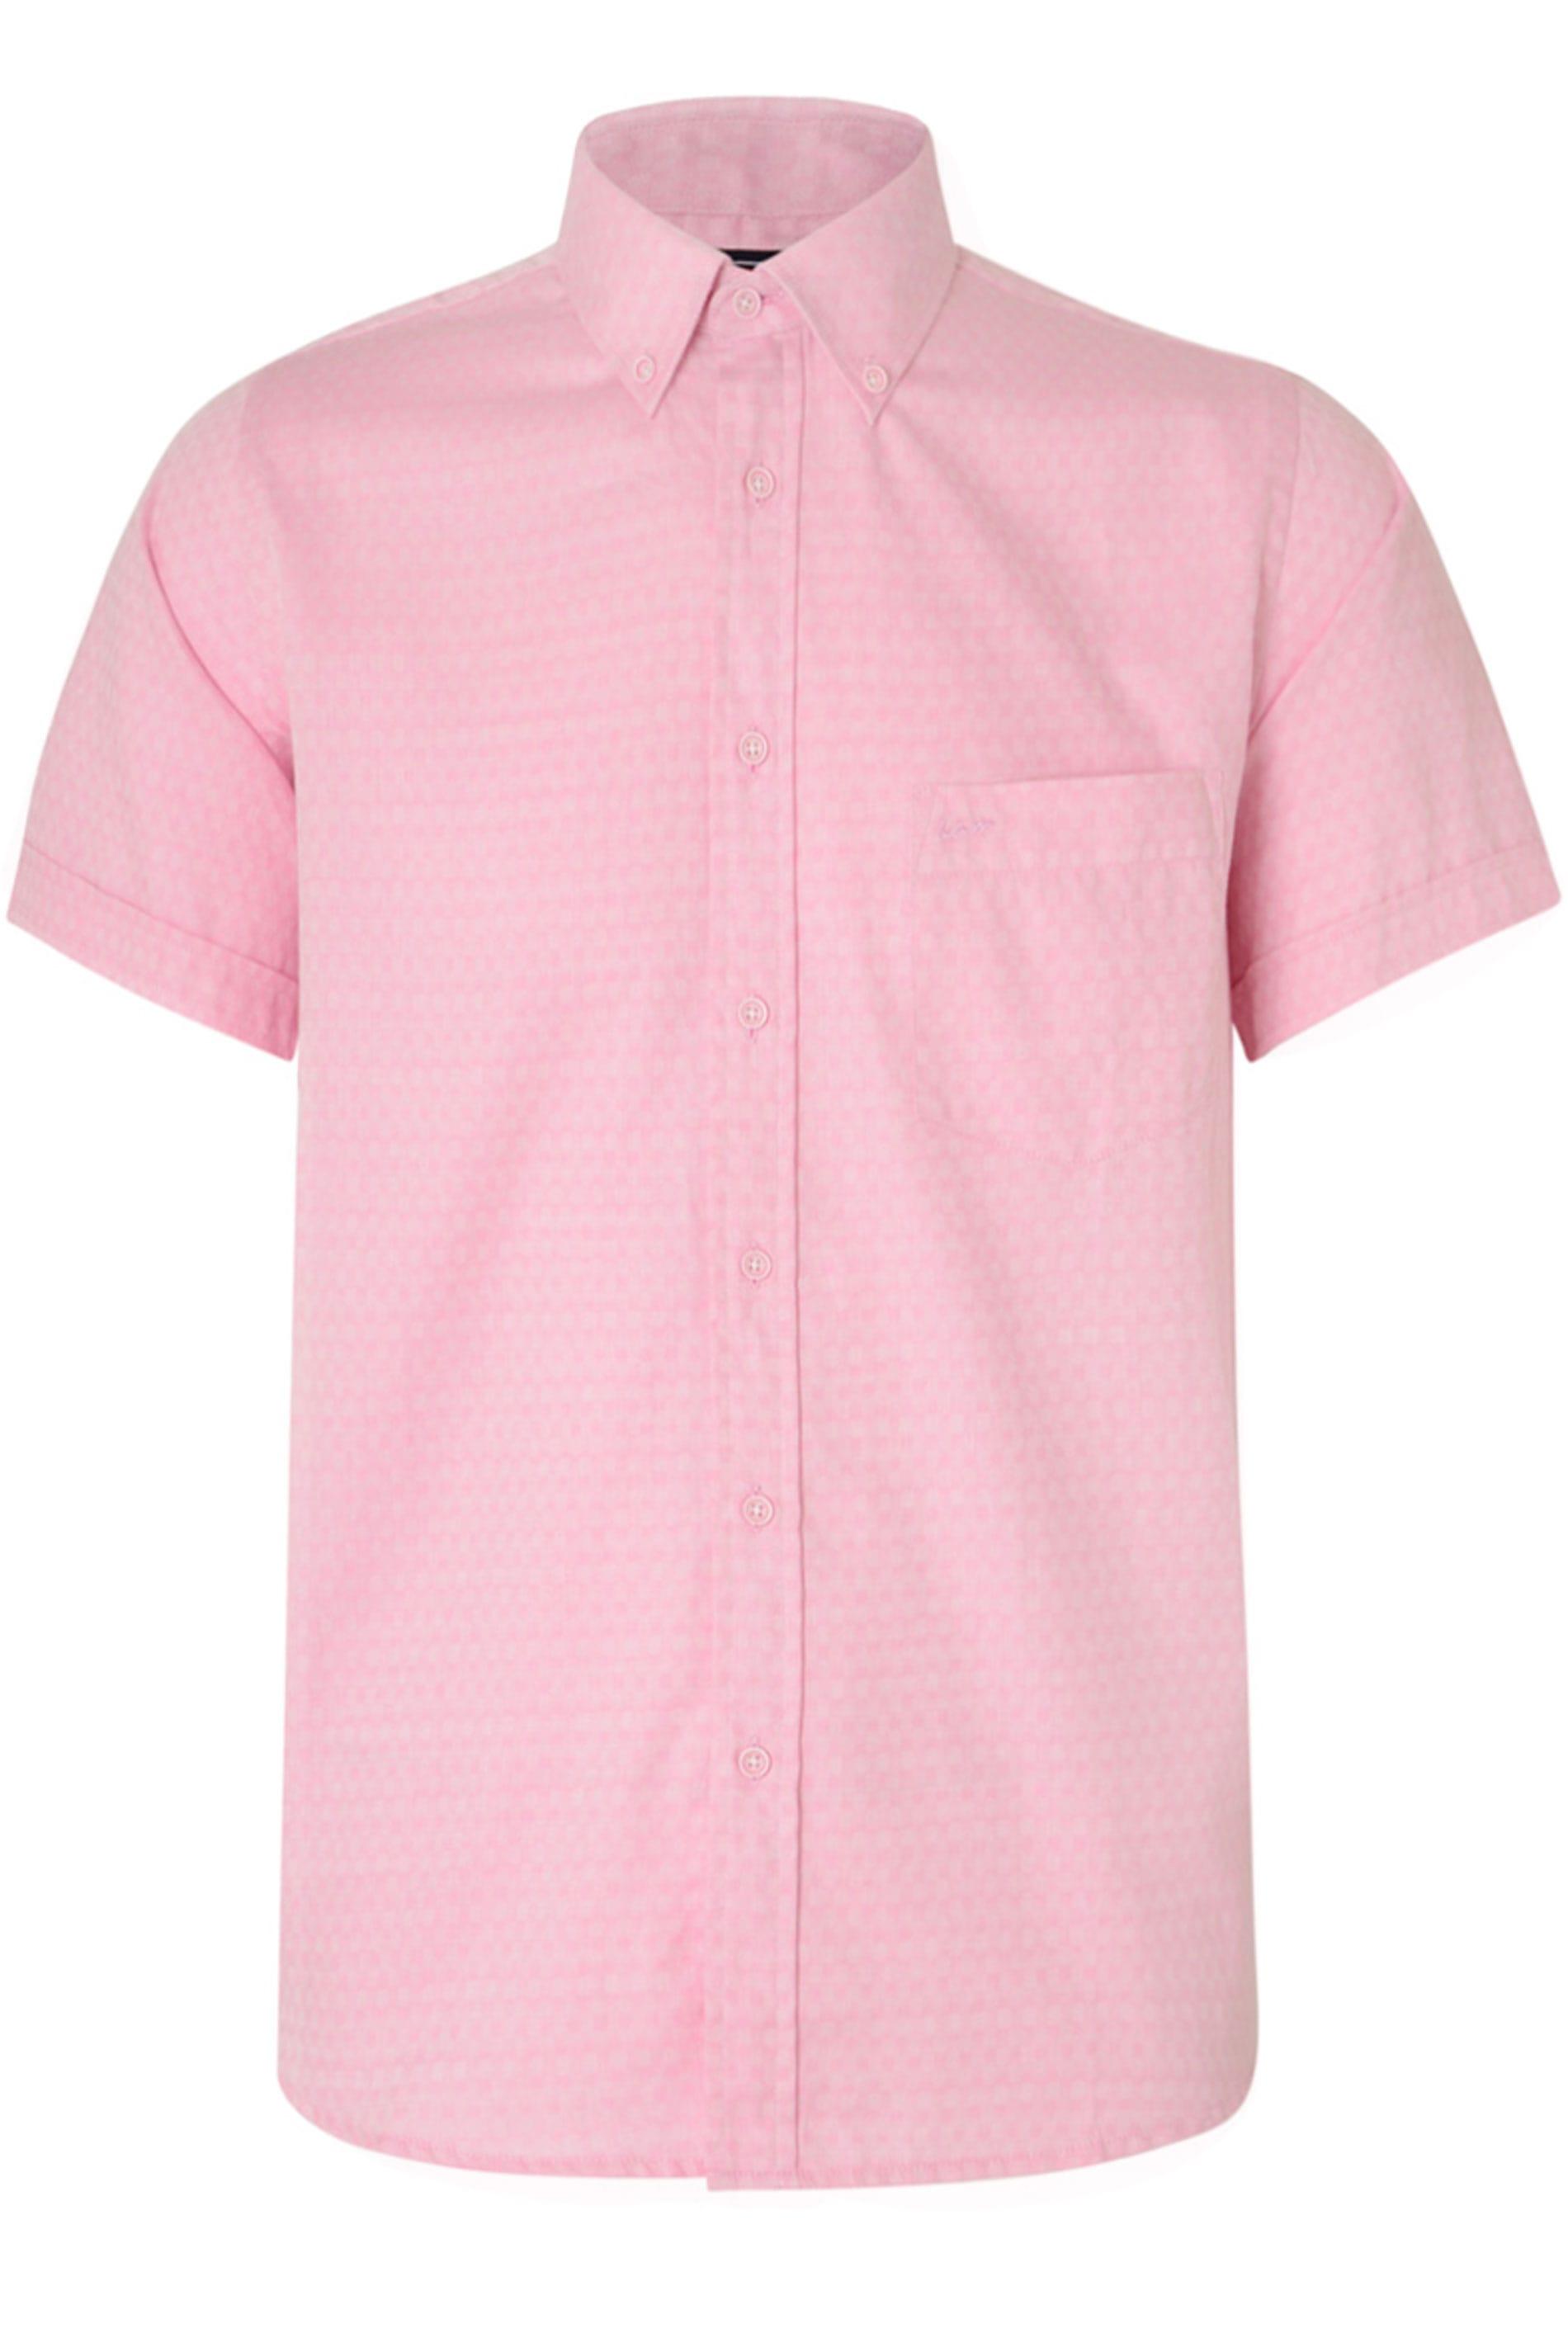 KAM Pink Herringbone Shirt